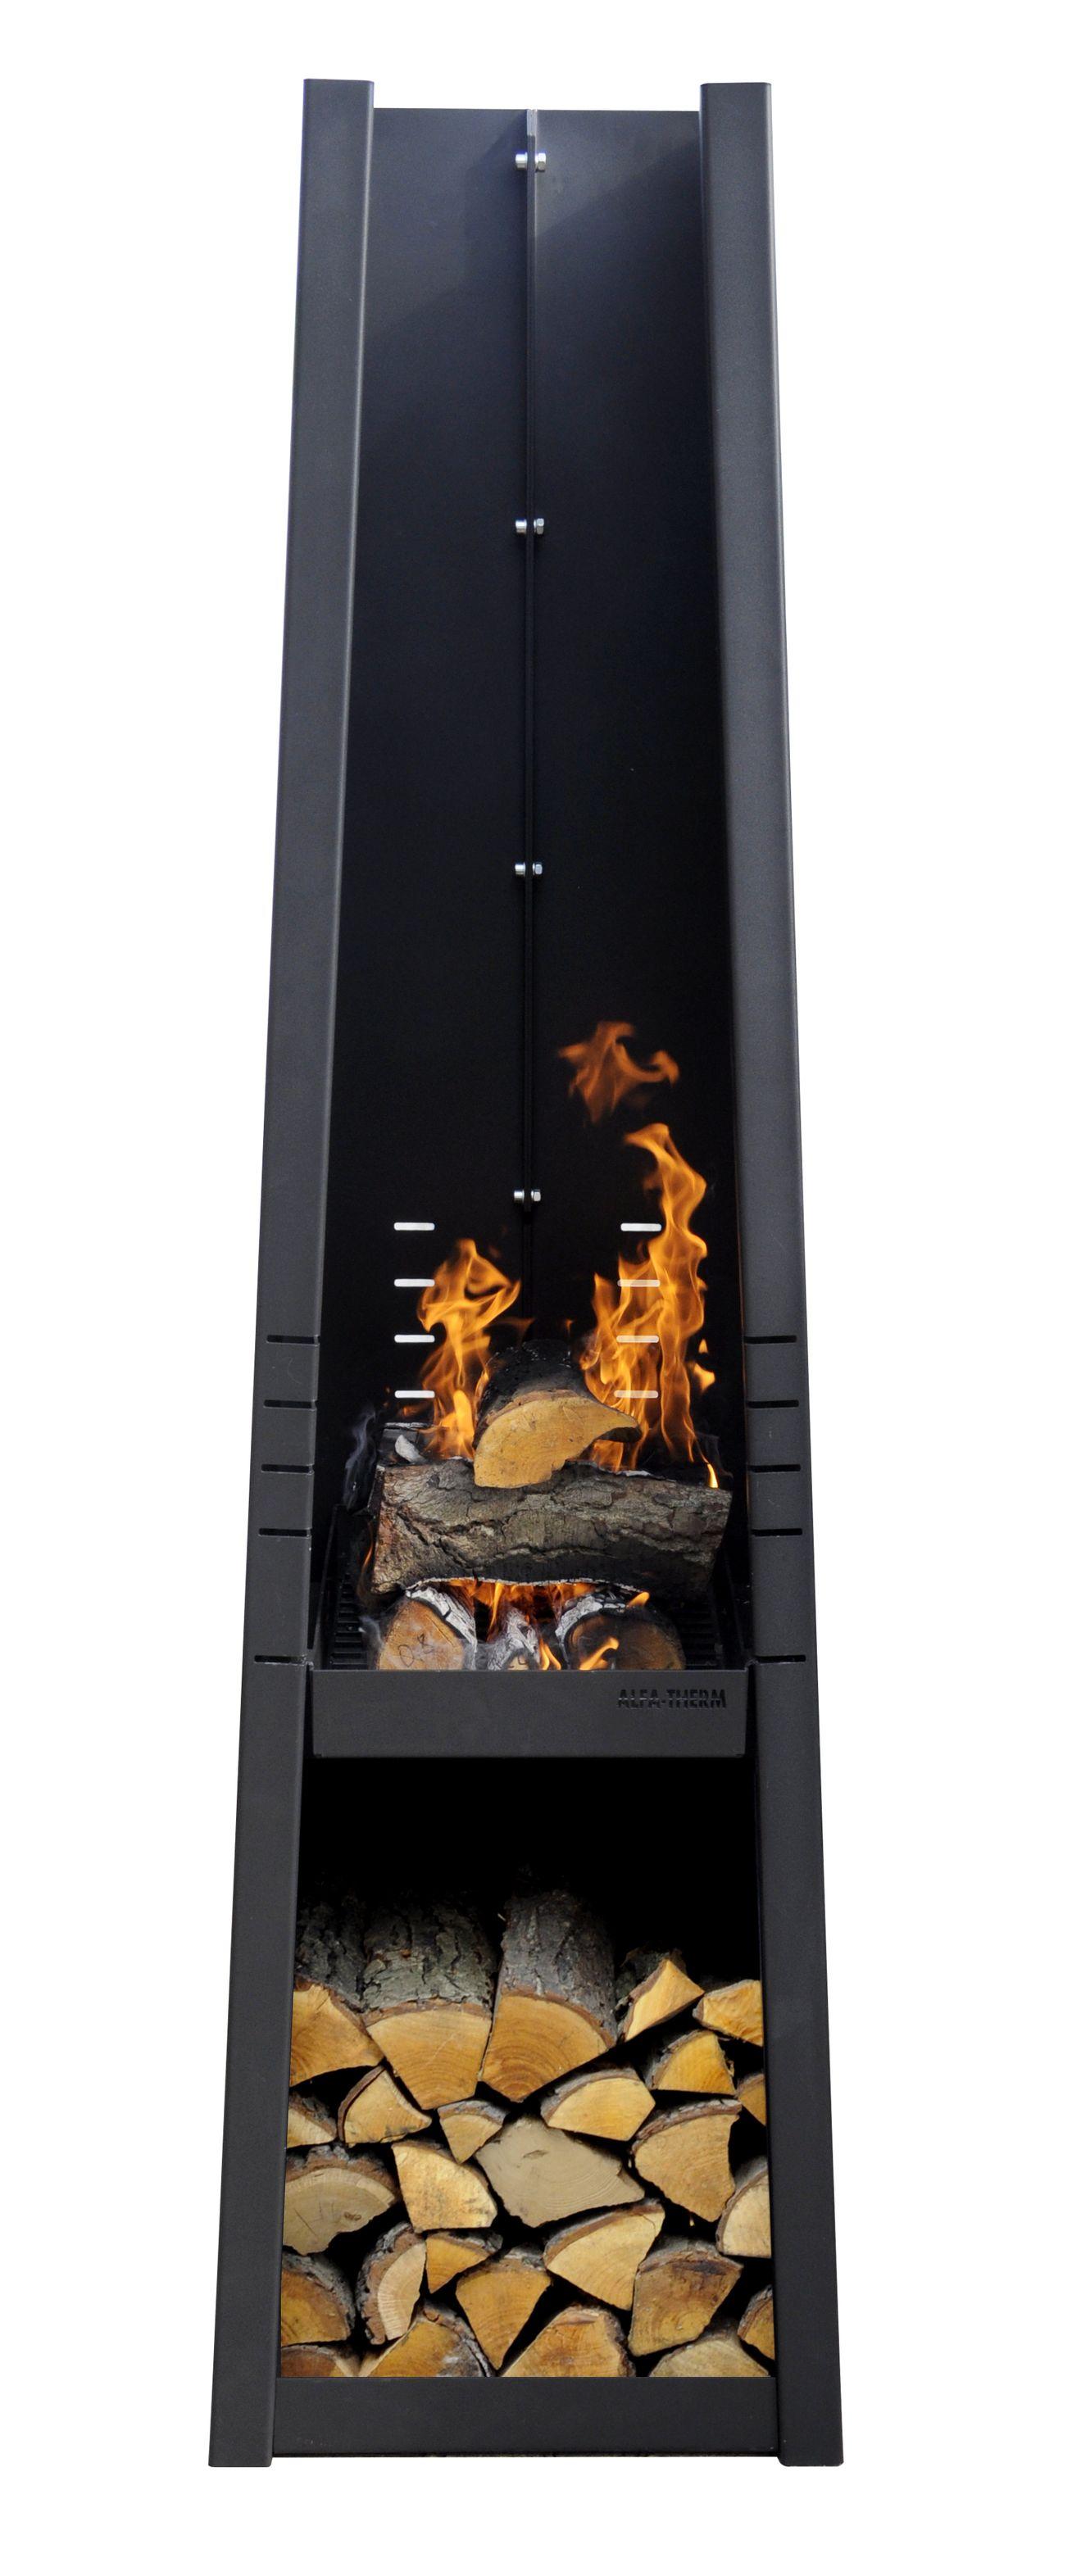 grillkamin michael gartengrillkamin gartengrill h he 1 80 m edelstahl grillrost ebay. Black Bedroom Furniture Sets. Home Design Ideas